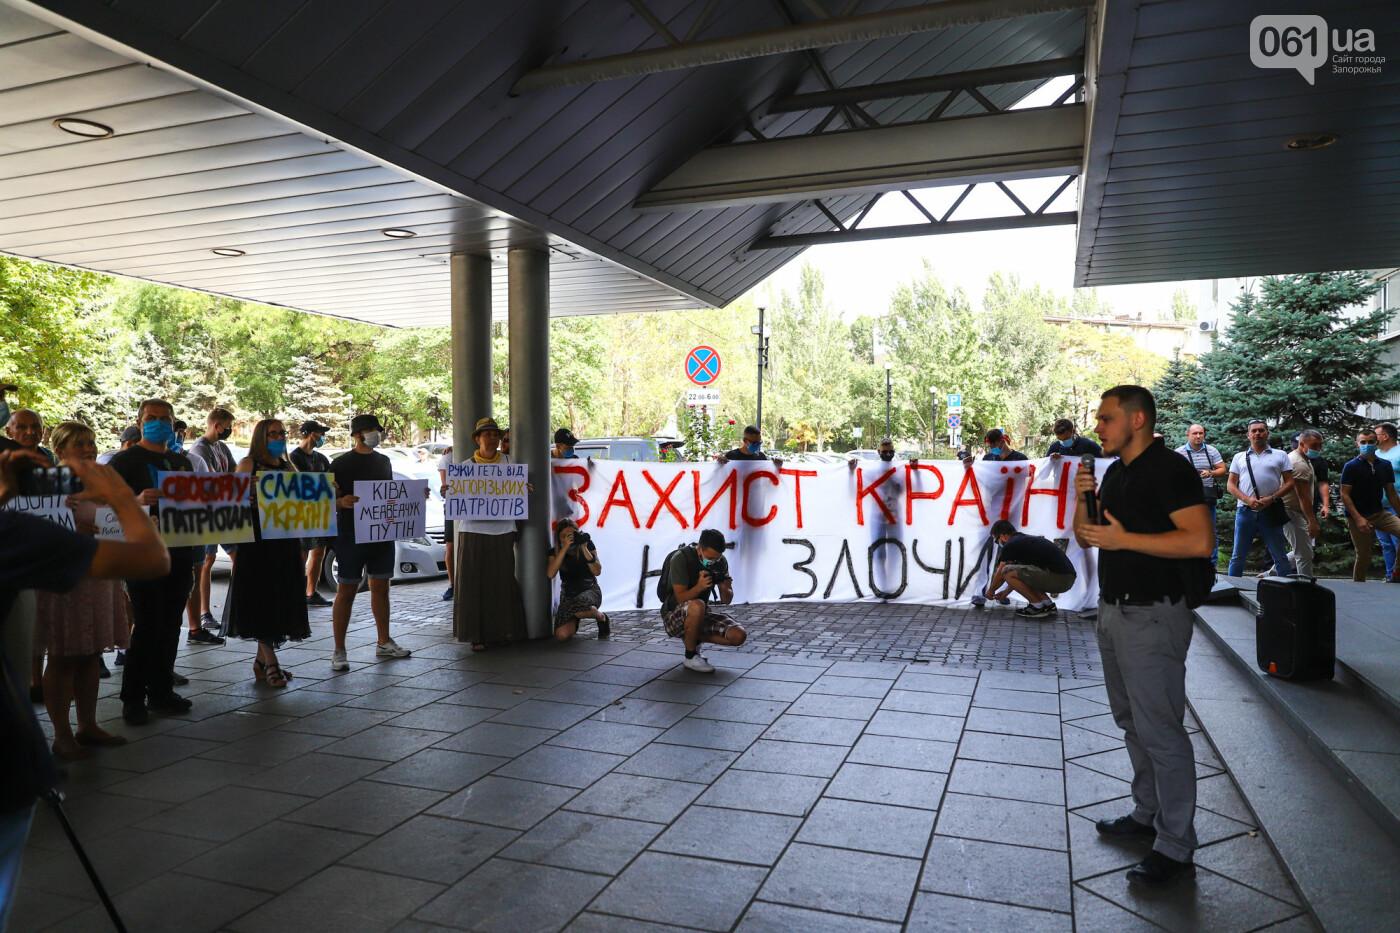 """Захист країни - не злочин"": в Запорожье патриоты провели митинг у стен нацполиции, - ФОТОРЕПОРТАЖ , фото-7"